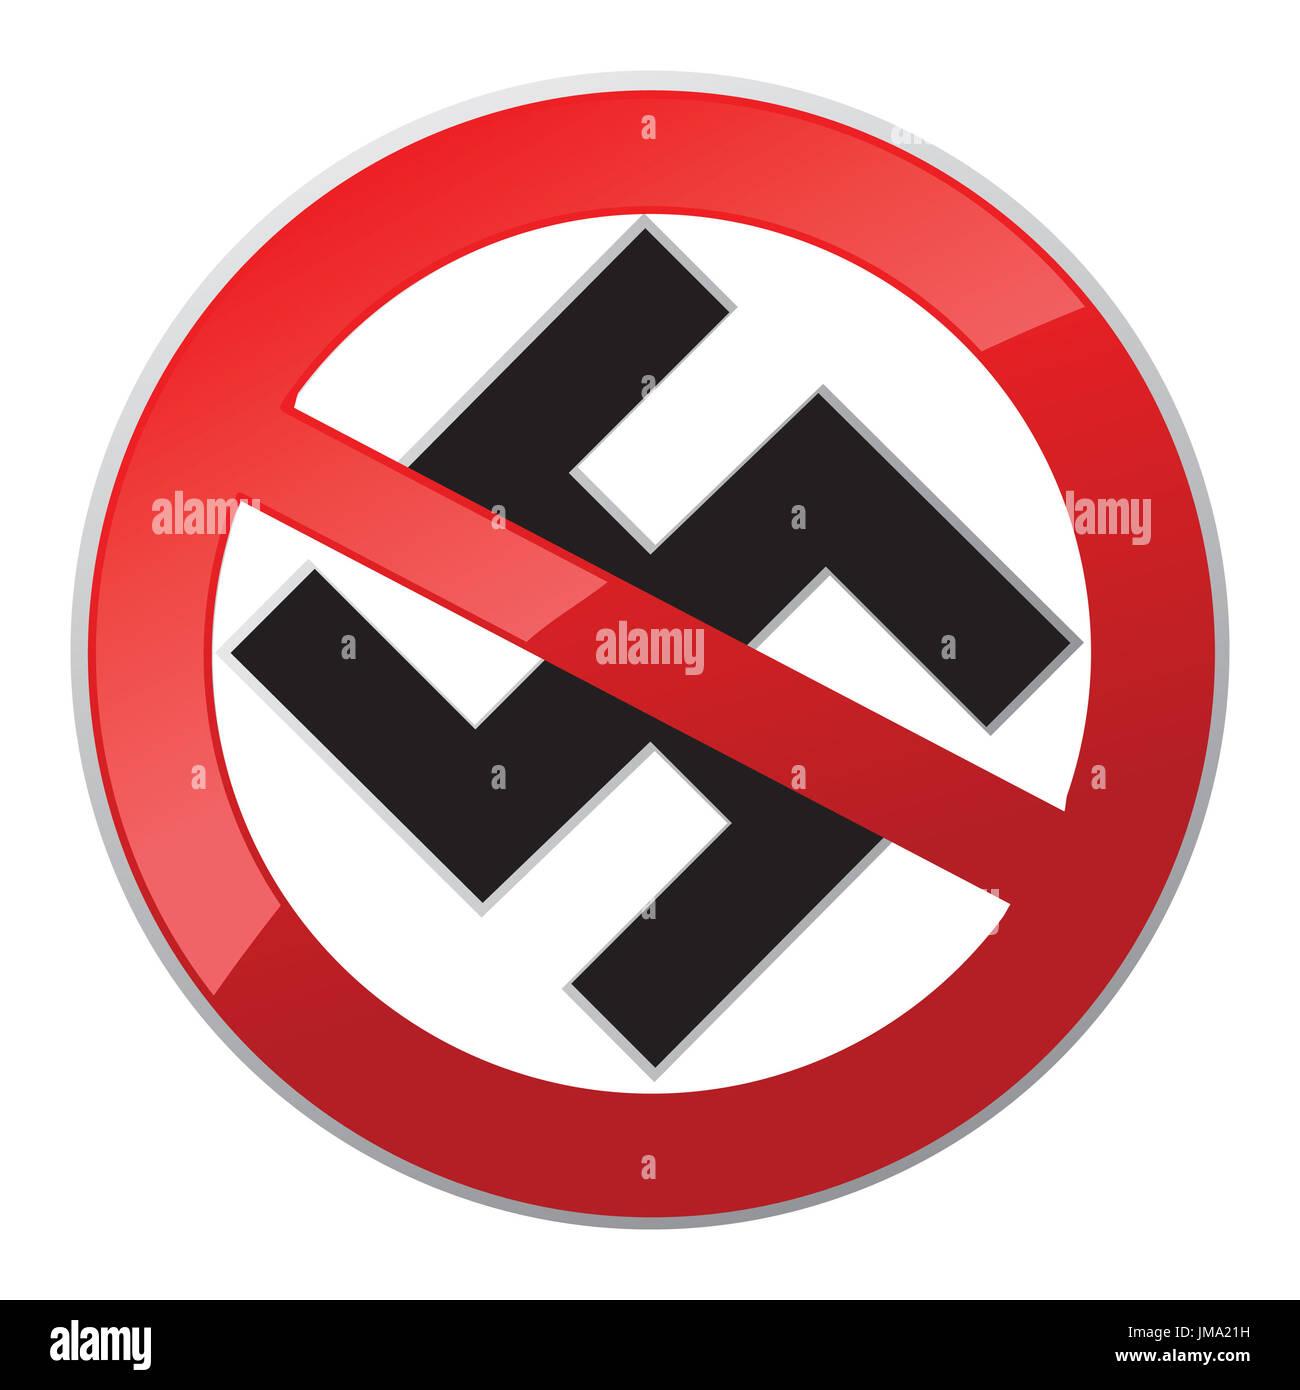 swastika nazi symbol cross stock photos amp swastika nazi